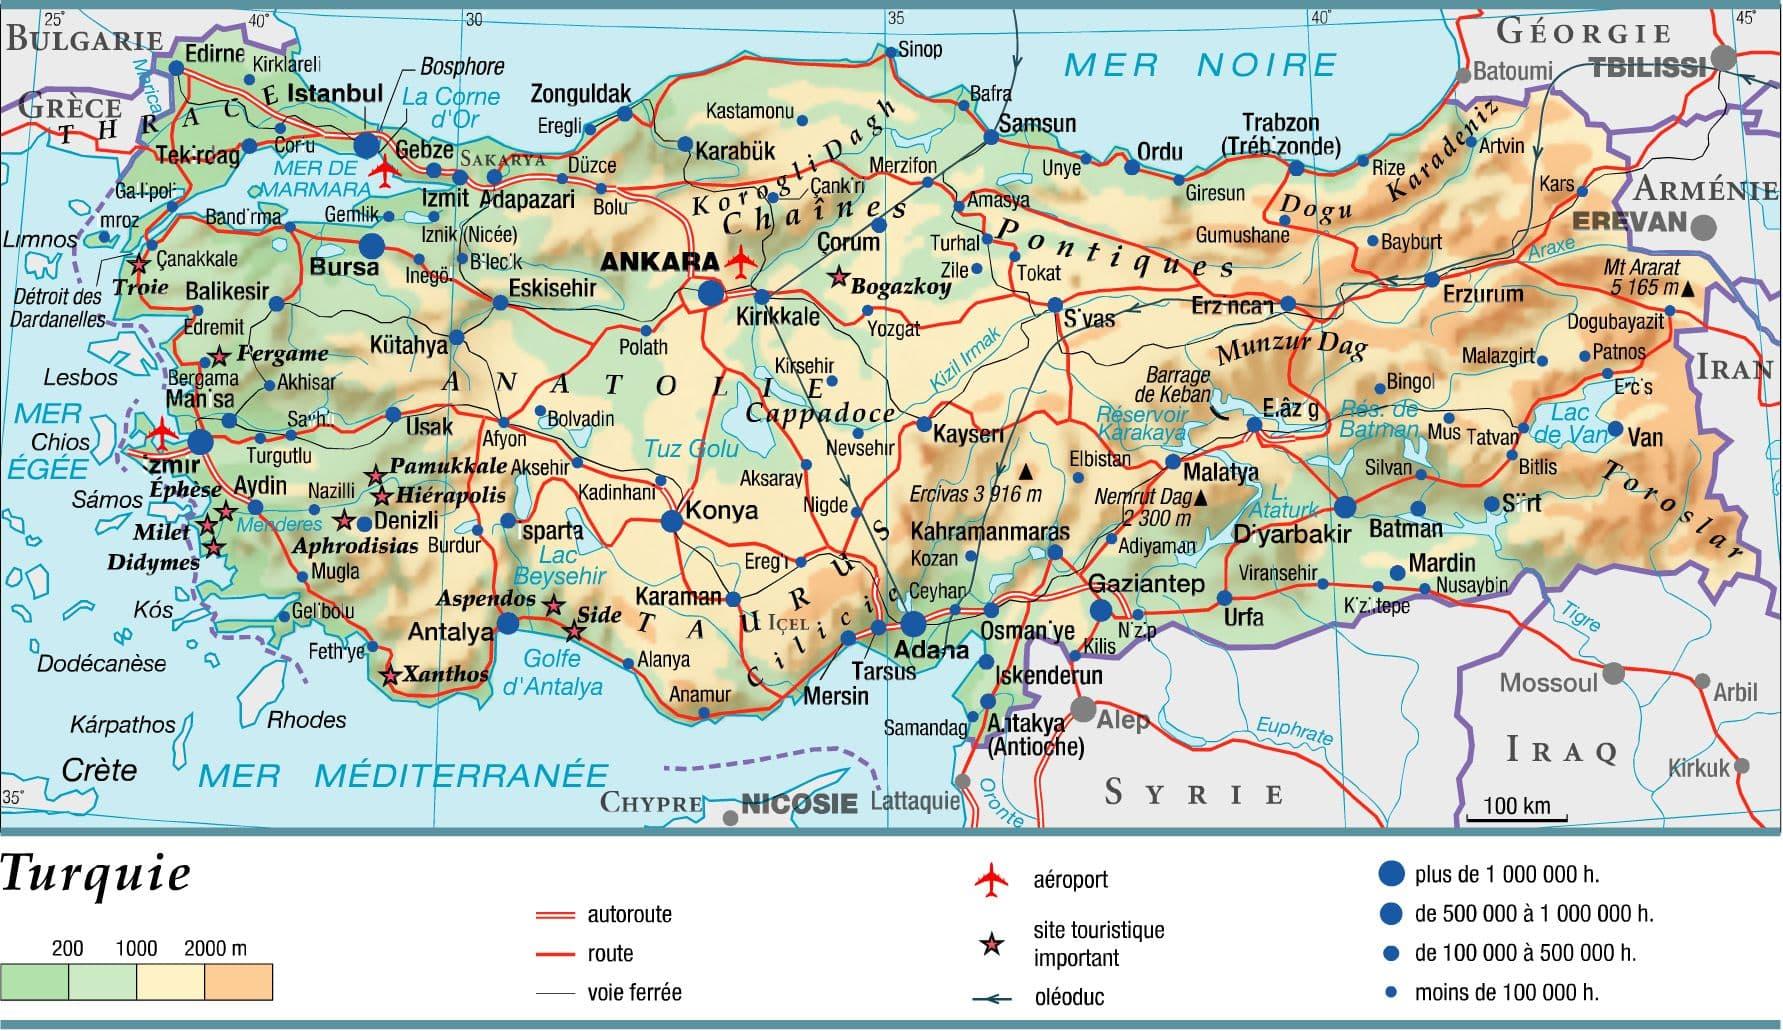 Carte Asie Relief Et Hydrographie.Encyclopedie Larousse En Ligne Turquie